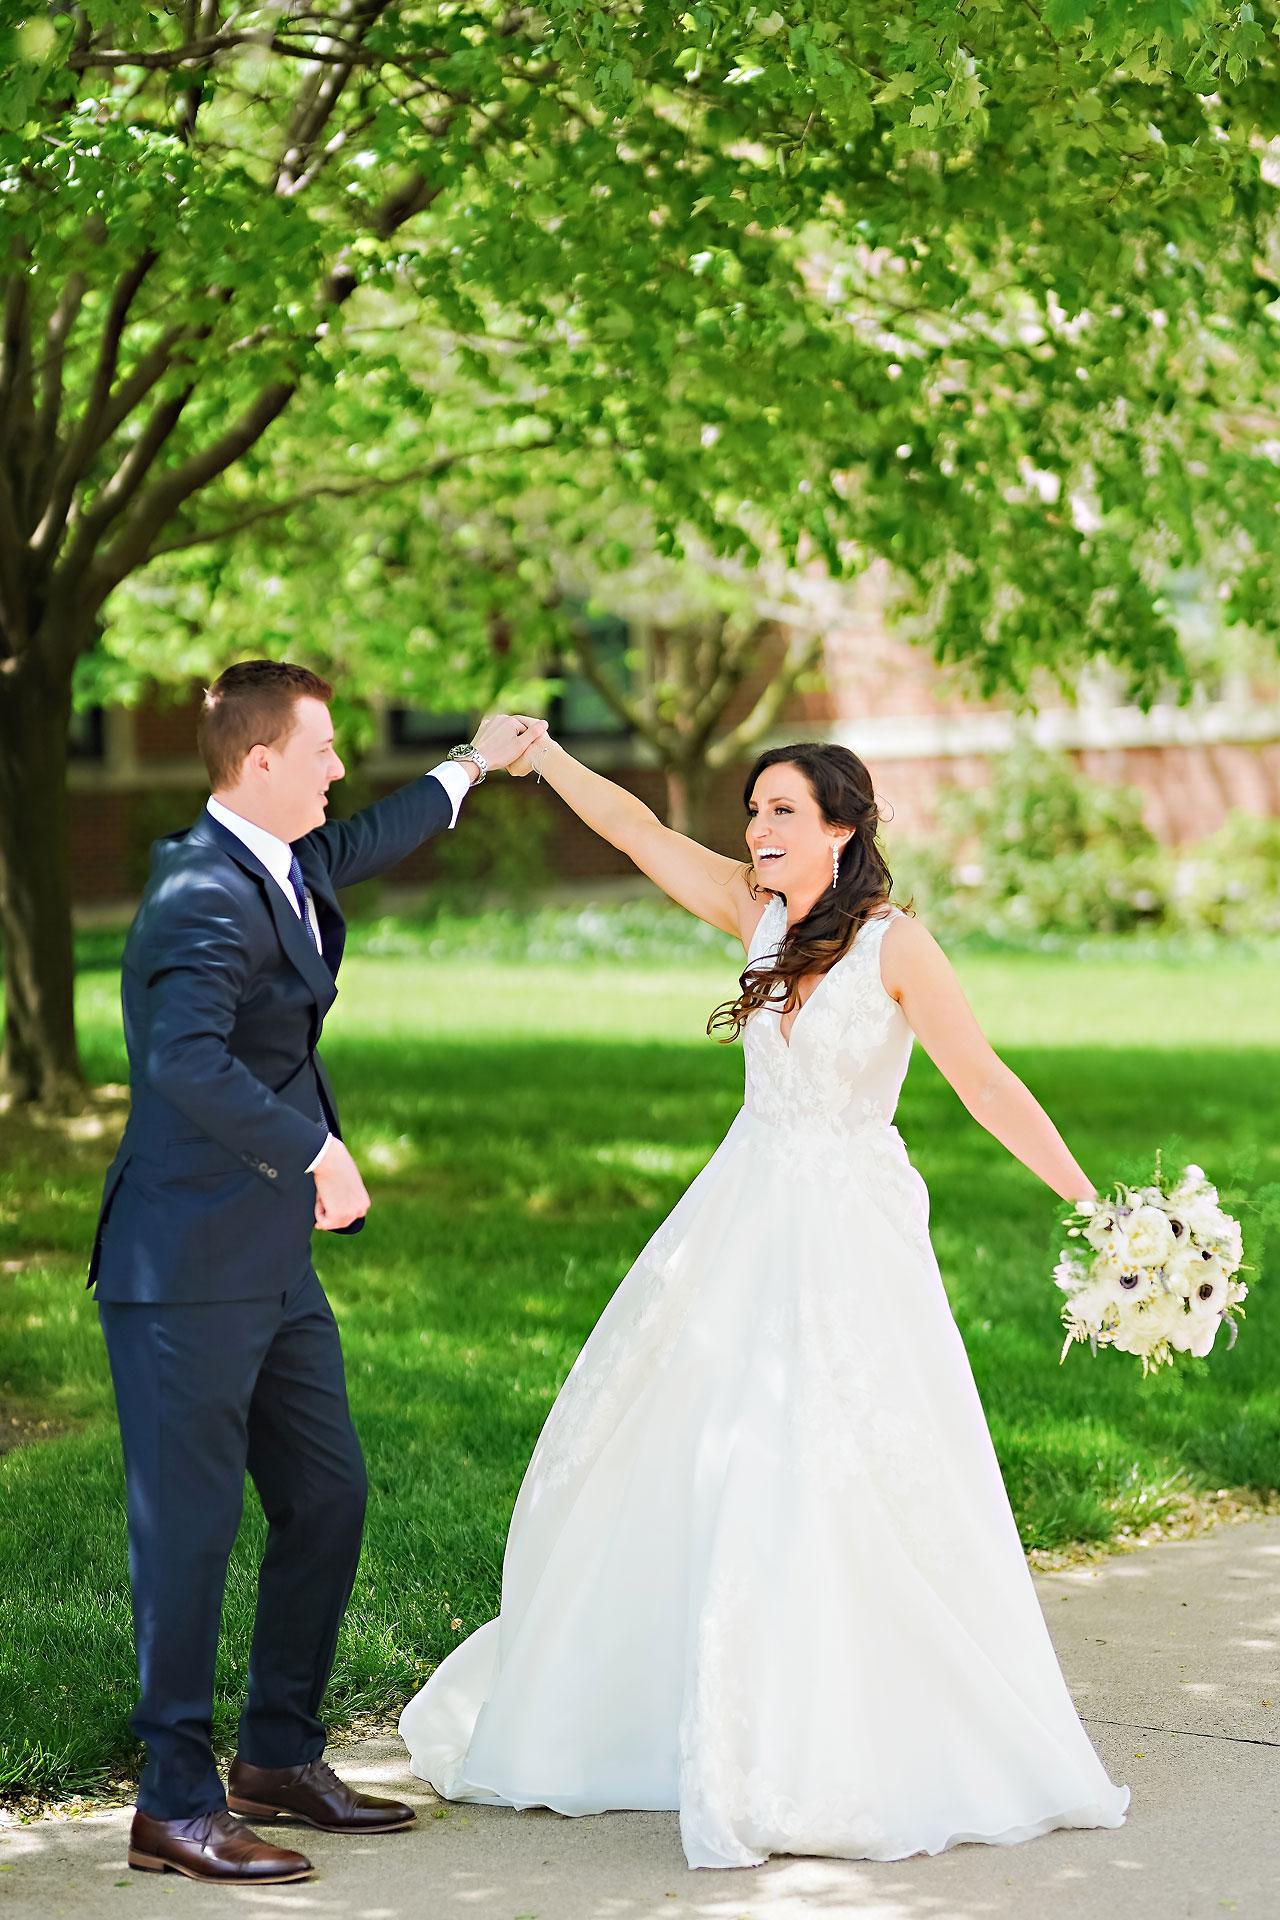 MacKinze John Lafayette Indiana Purdue Wedding 105